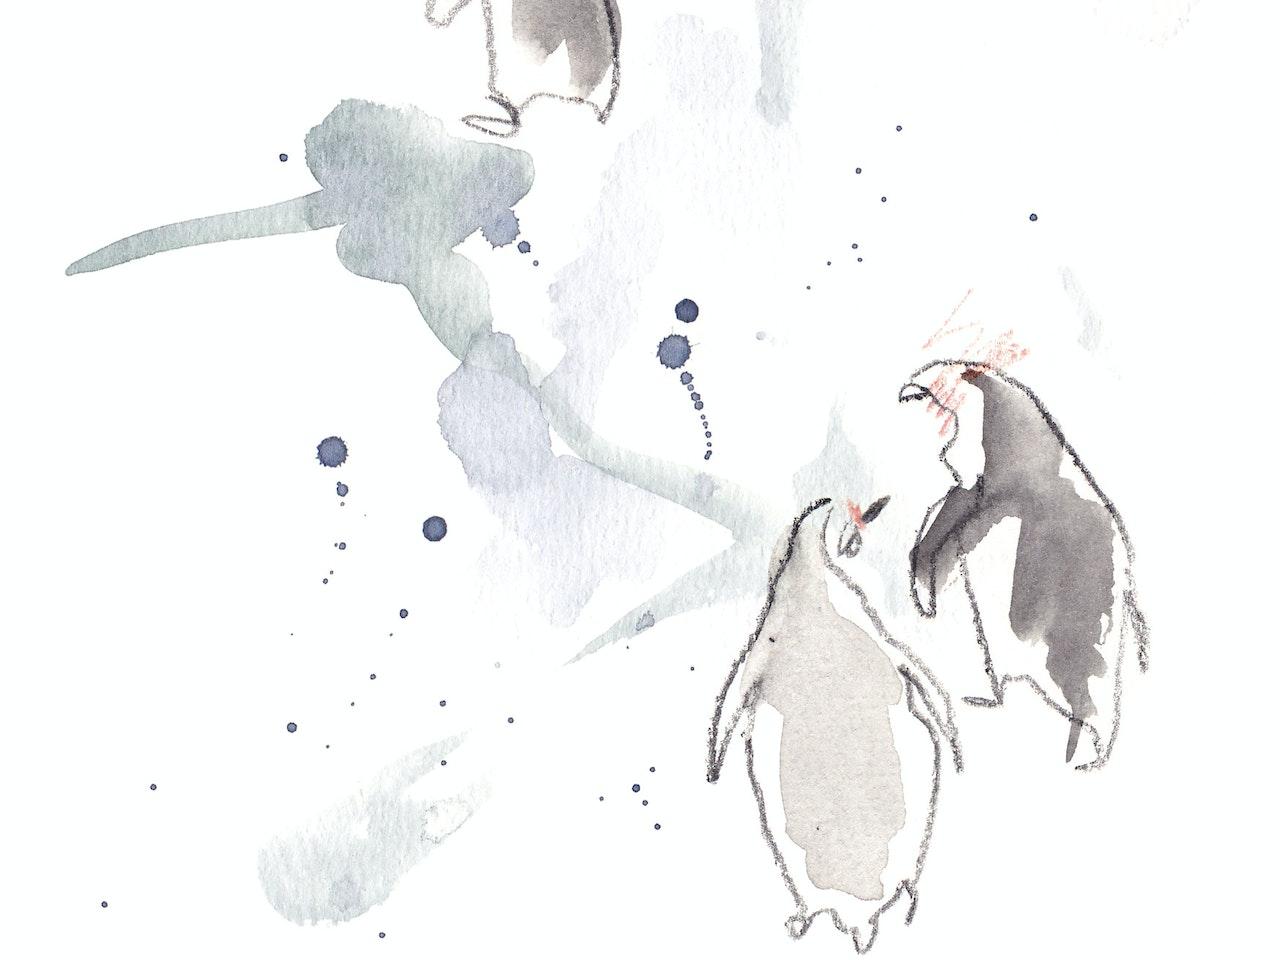 Humboldt's Penguin2